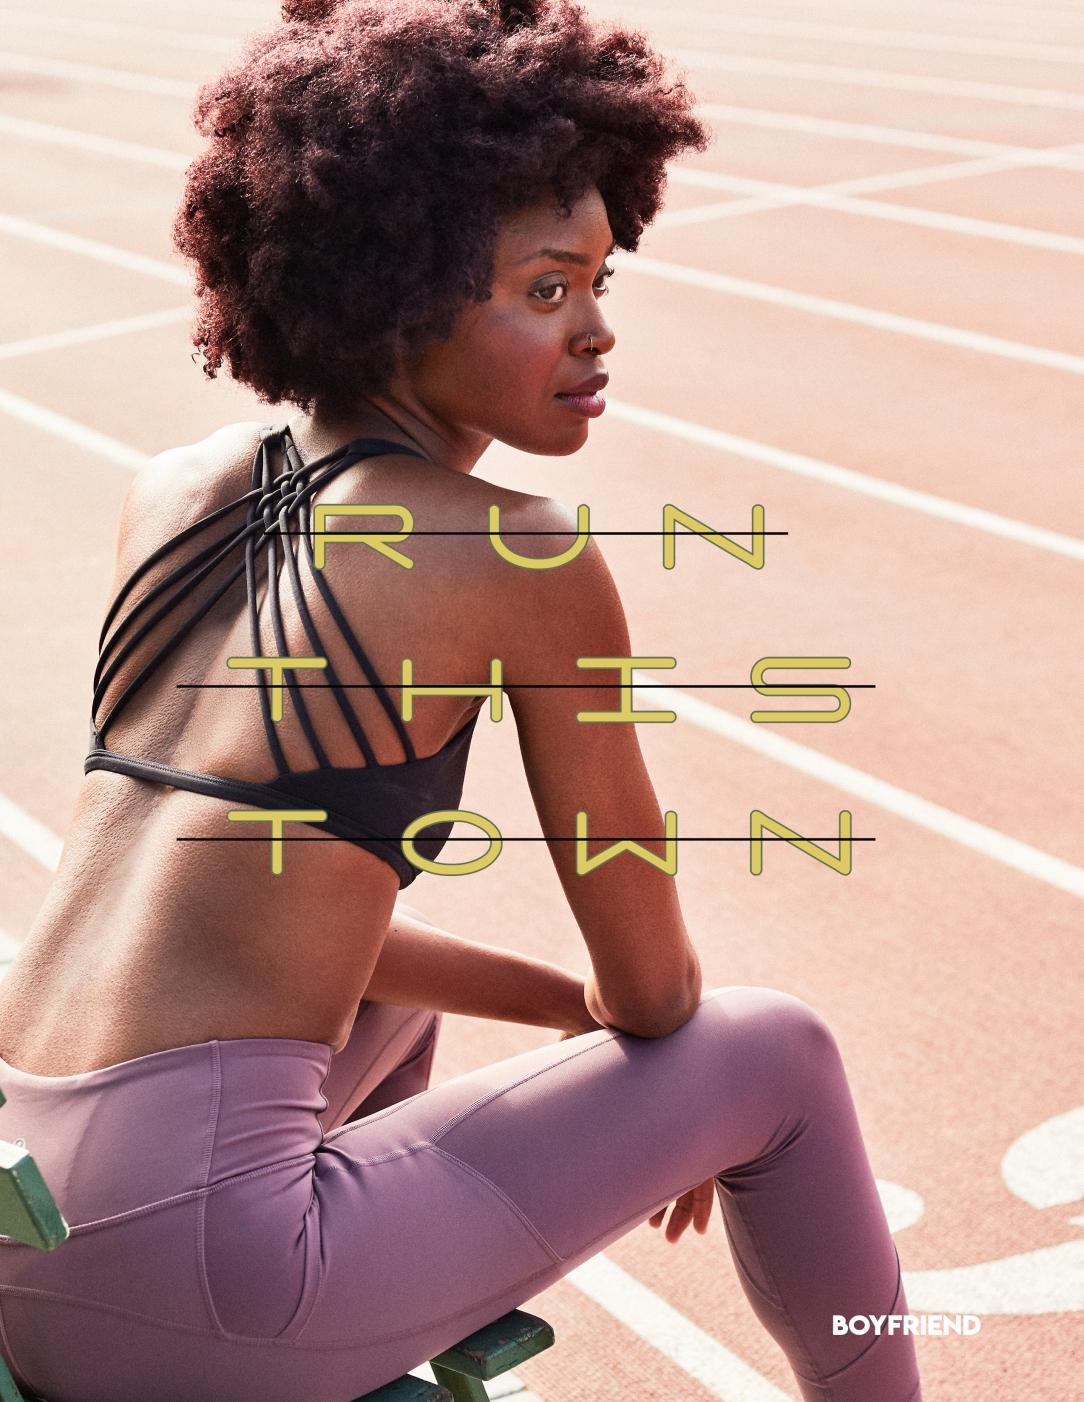 Boyfriend Mag - September 2018 - Run This Town - Jeffry Raposas